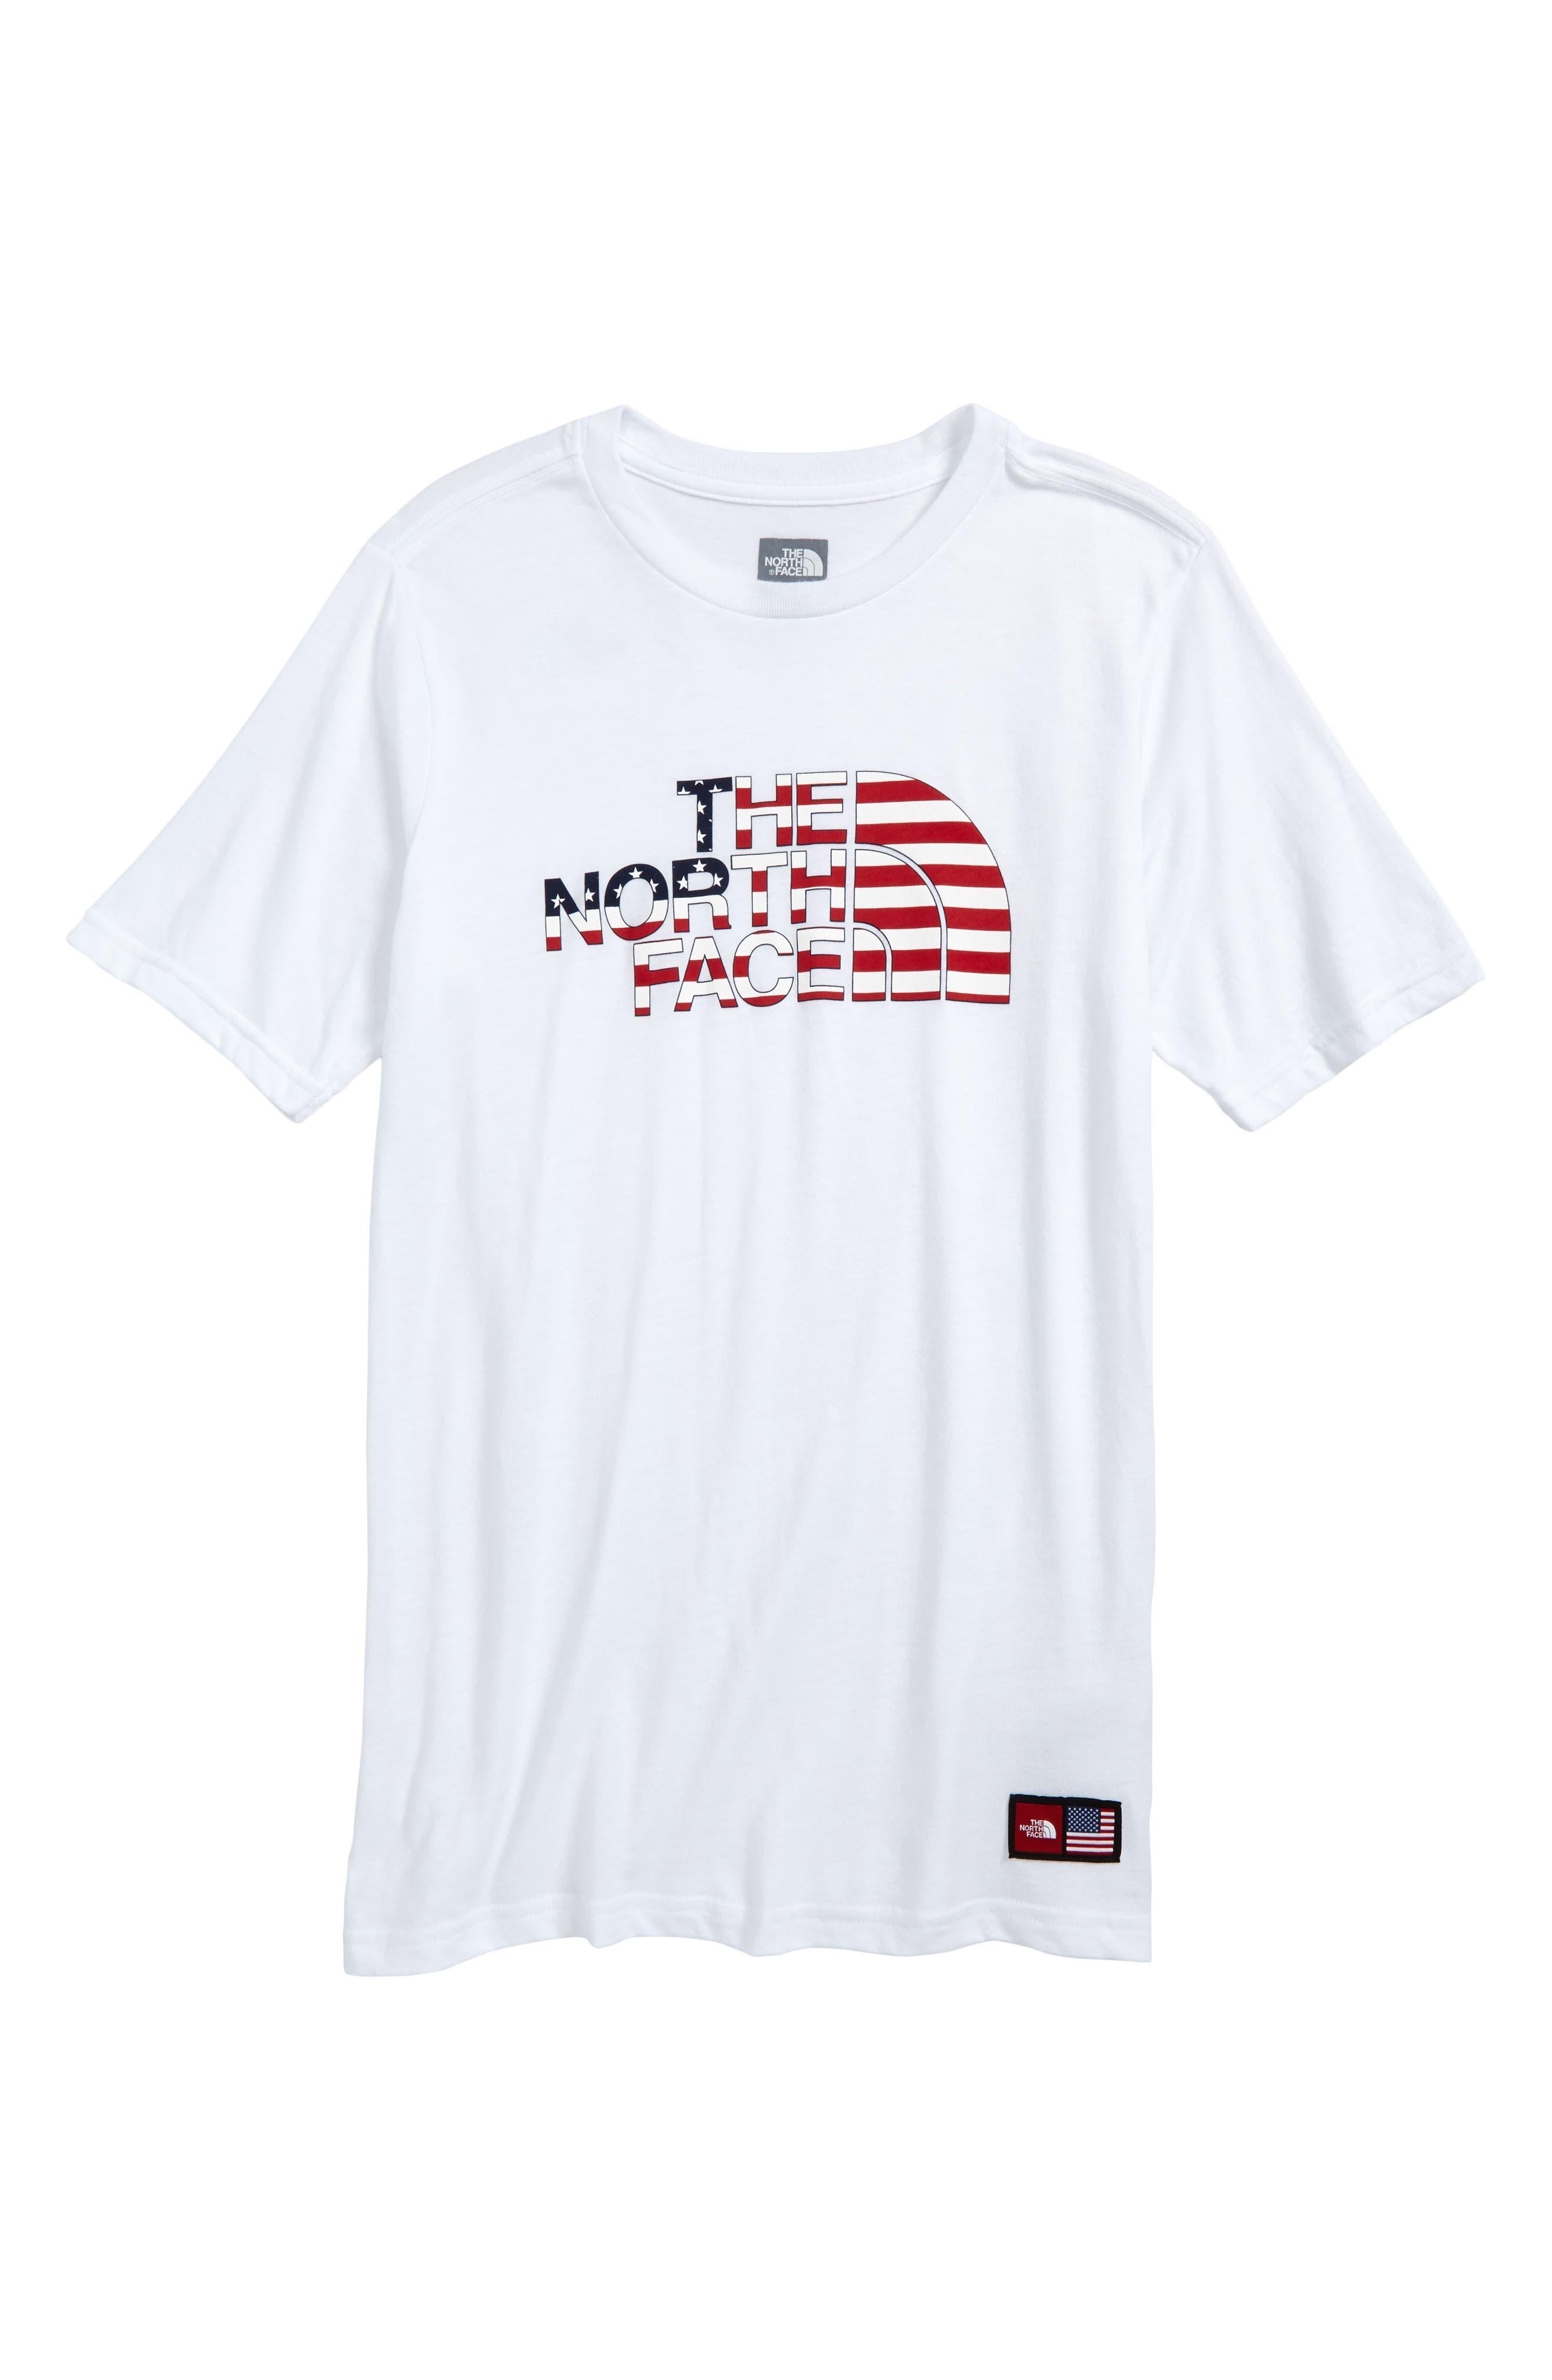 International Collection Crewneck T-Shirt,                             Main thumbnail 1, color,                             100